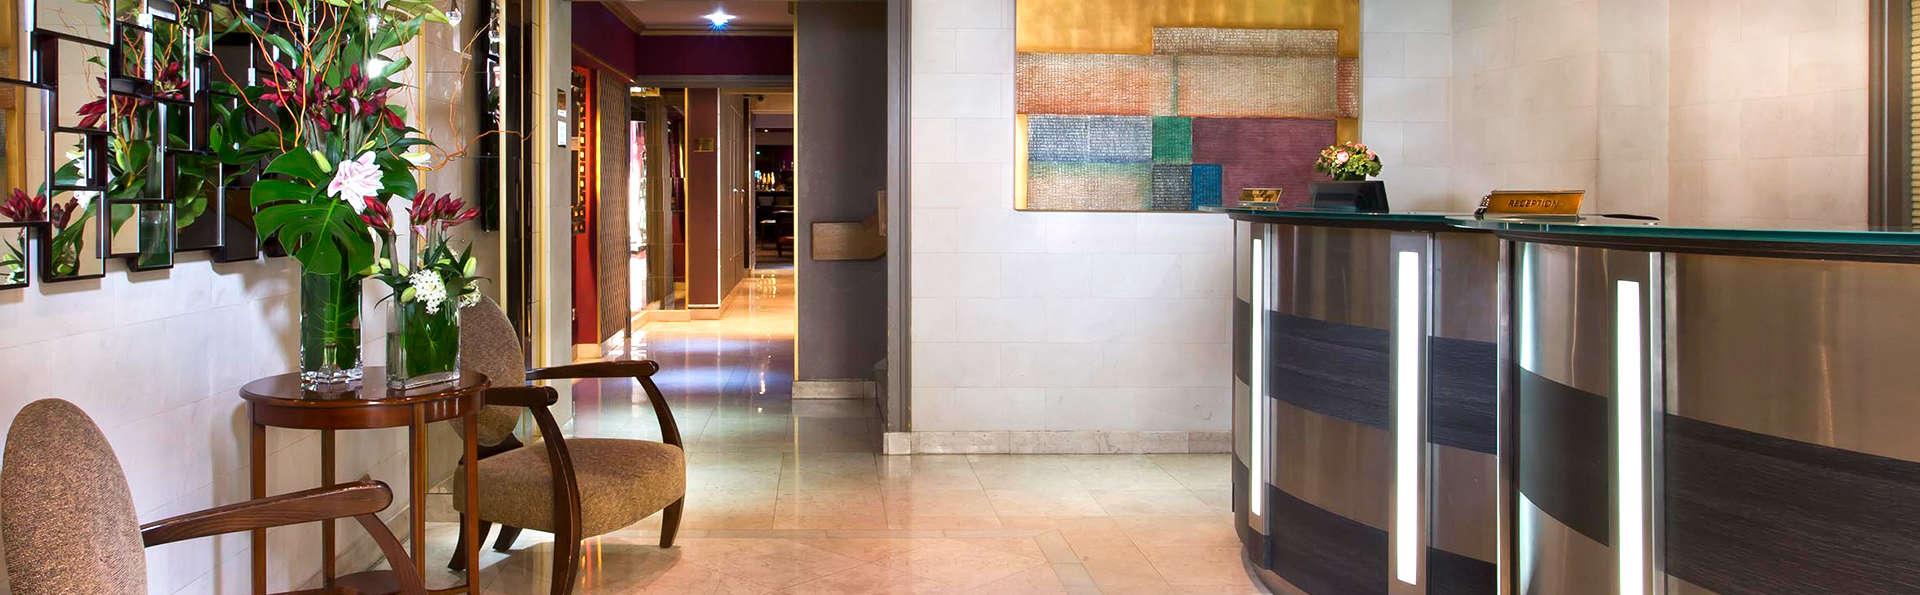 Hôtel Le Pera - Edit_Reception.jpg